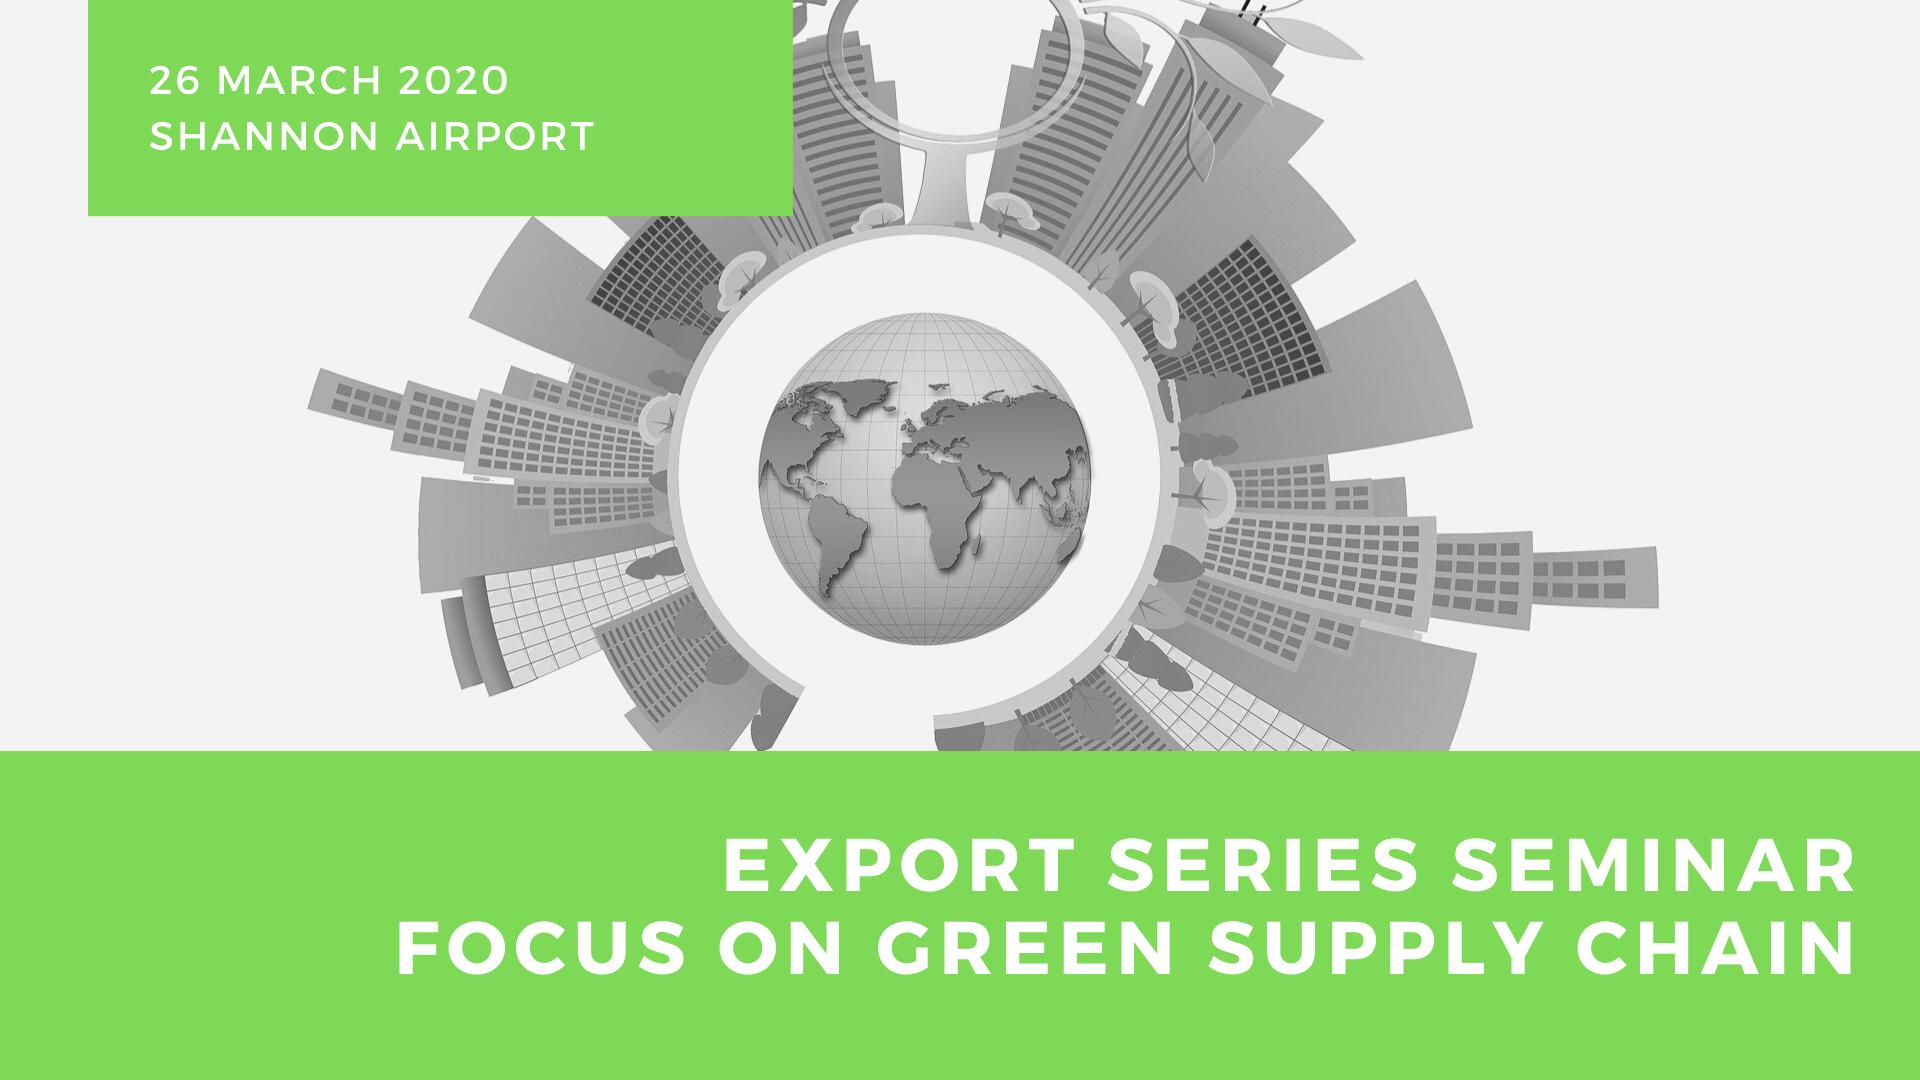 Export Series Seminar- Focus on Green Supply Chain